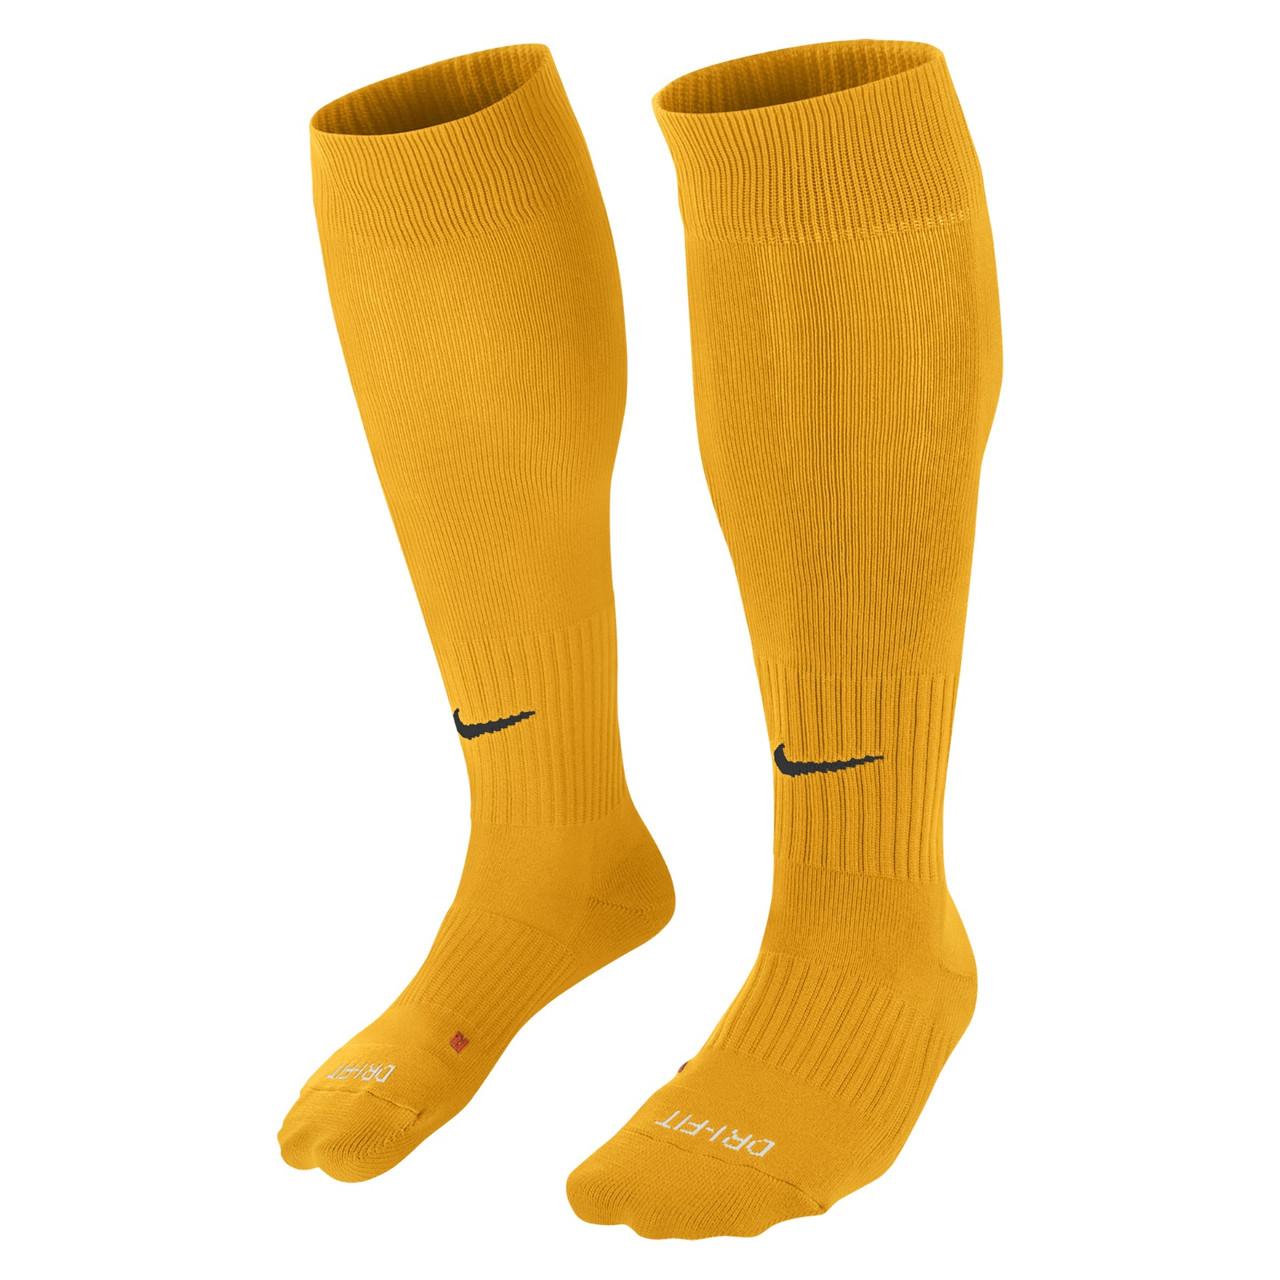 Гетры футбольные Nike Classic II Cushion SX5728-739 Желтый L (42-46) (659658114951)